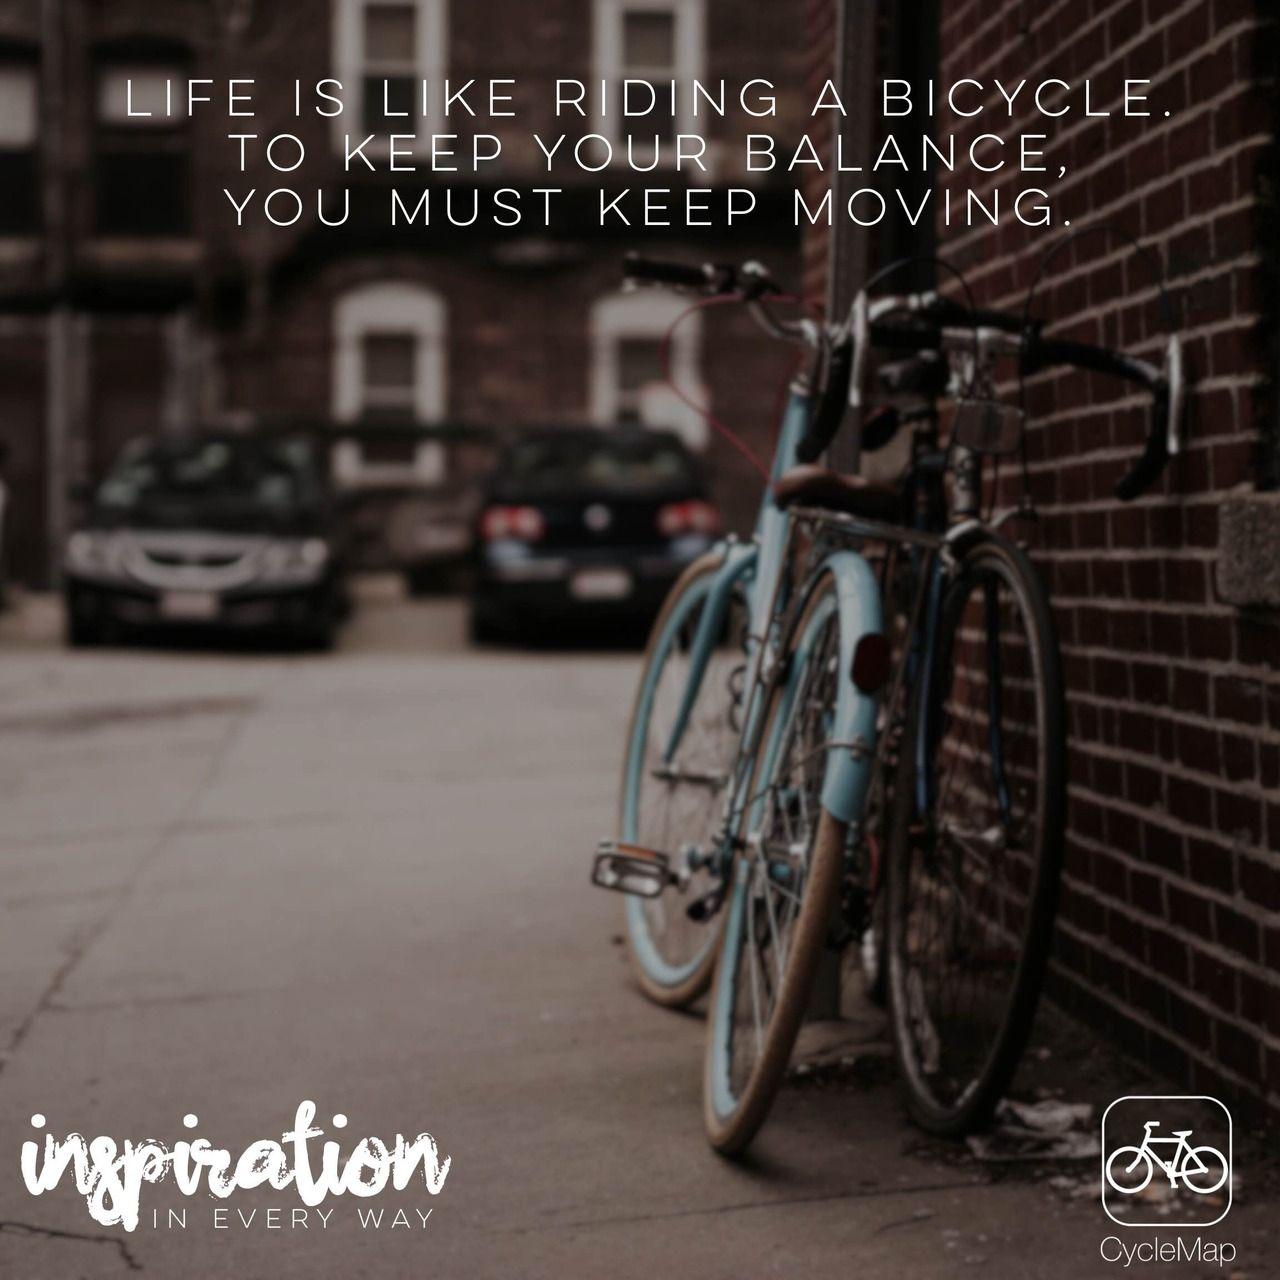 Motivationmonday Keep Riding That Bike Mondaymotivation Qotd